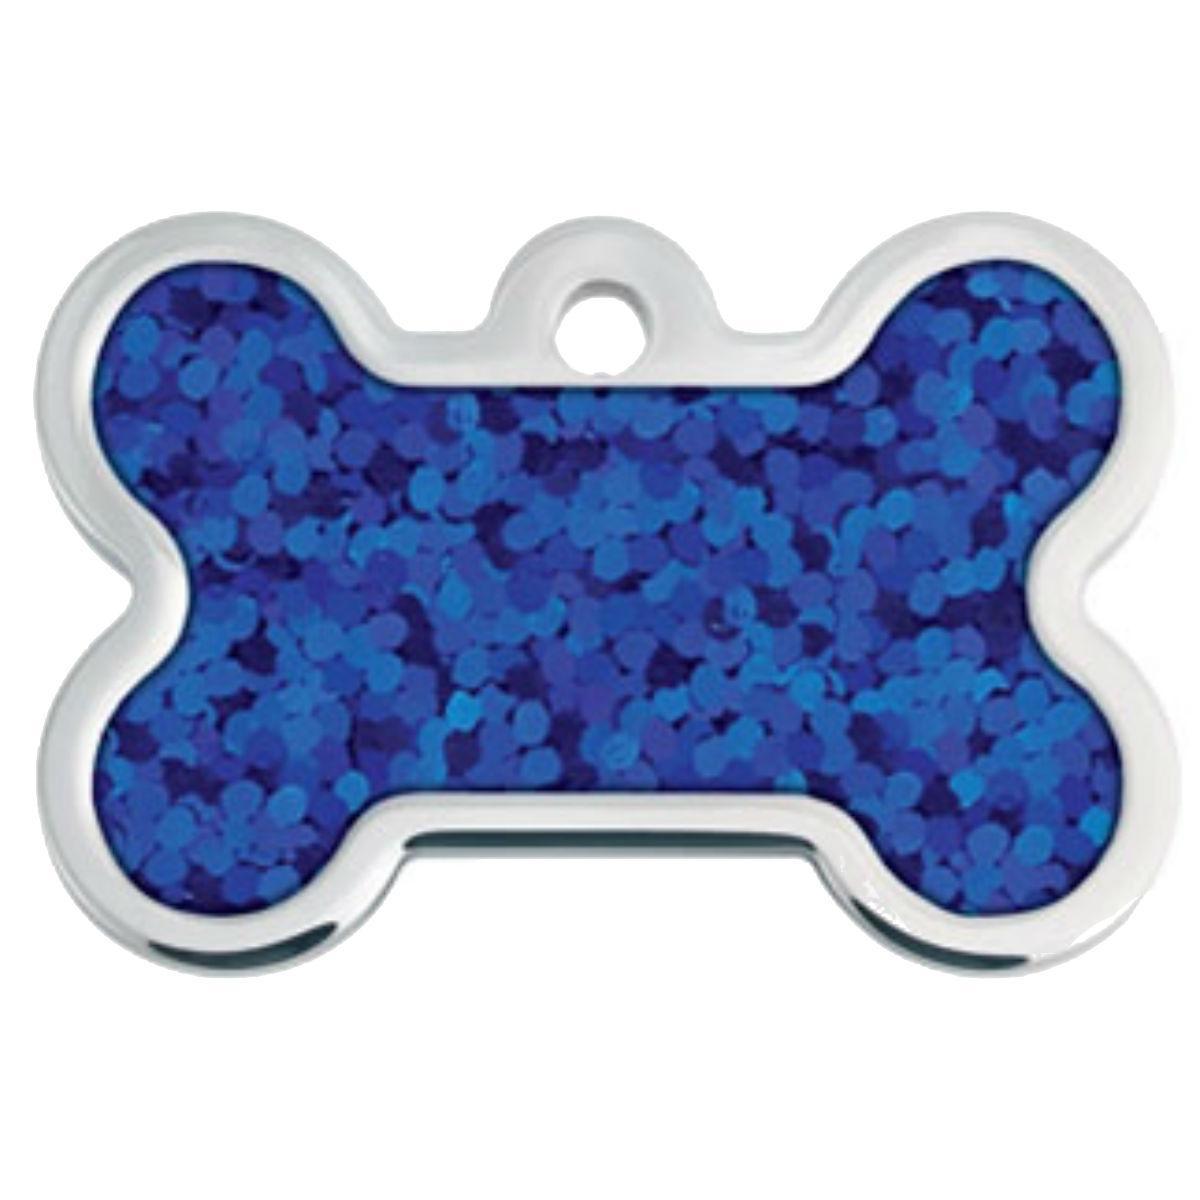 Hologram Bone Large Engravable Pet I.D. Tag - Blue